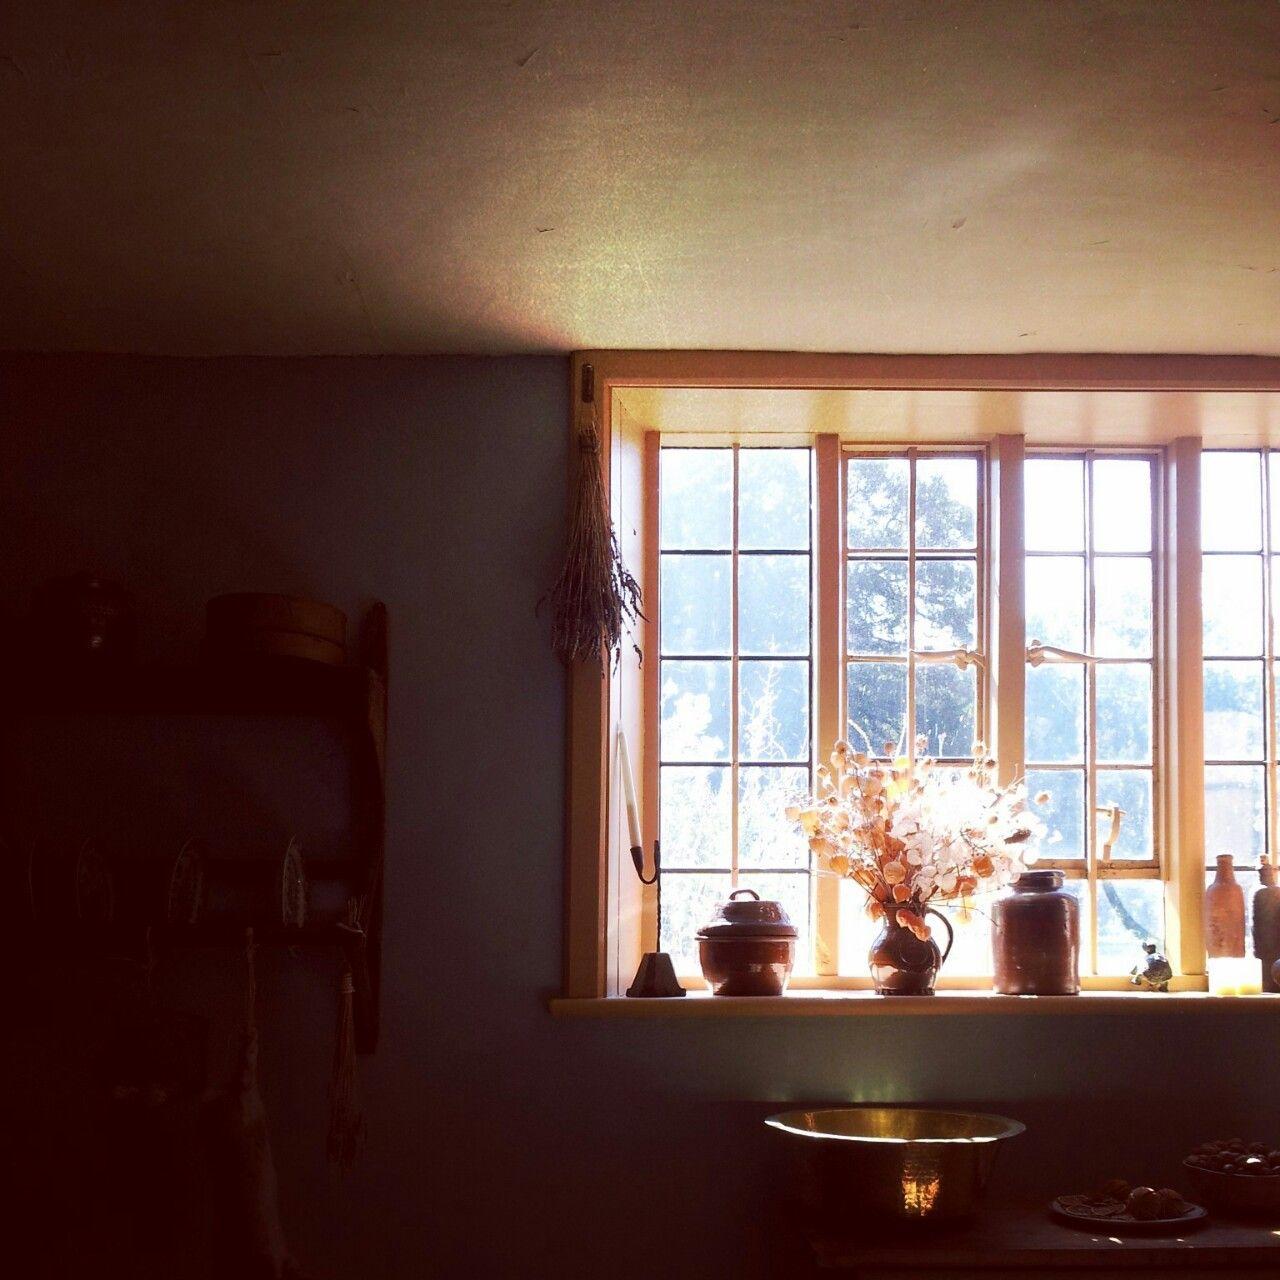 The kitchen at Gilbert White's house.